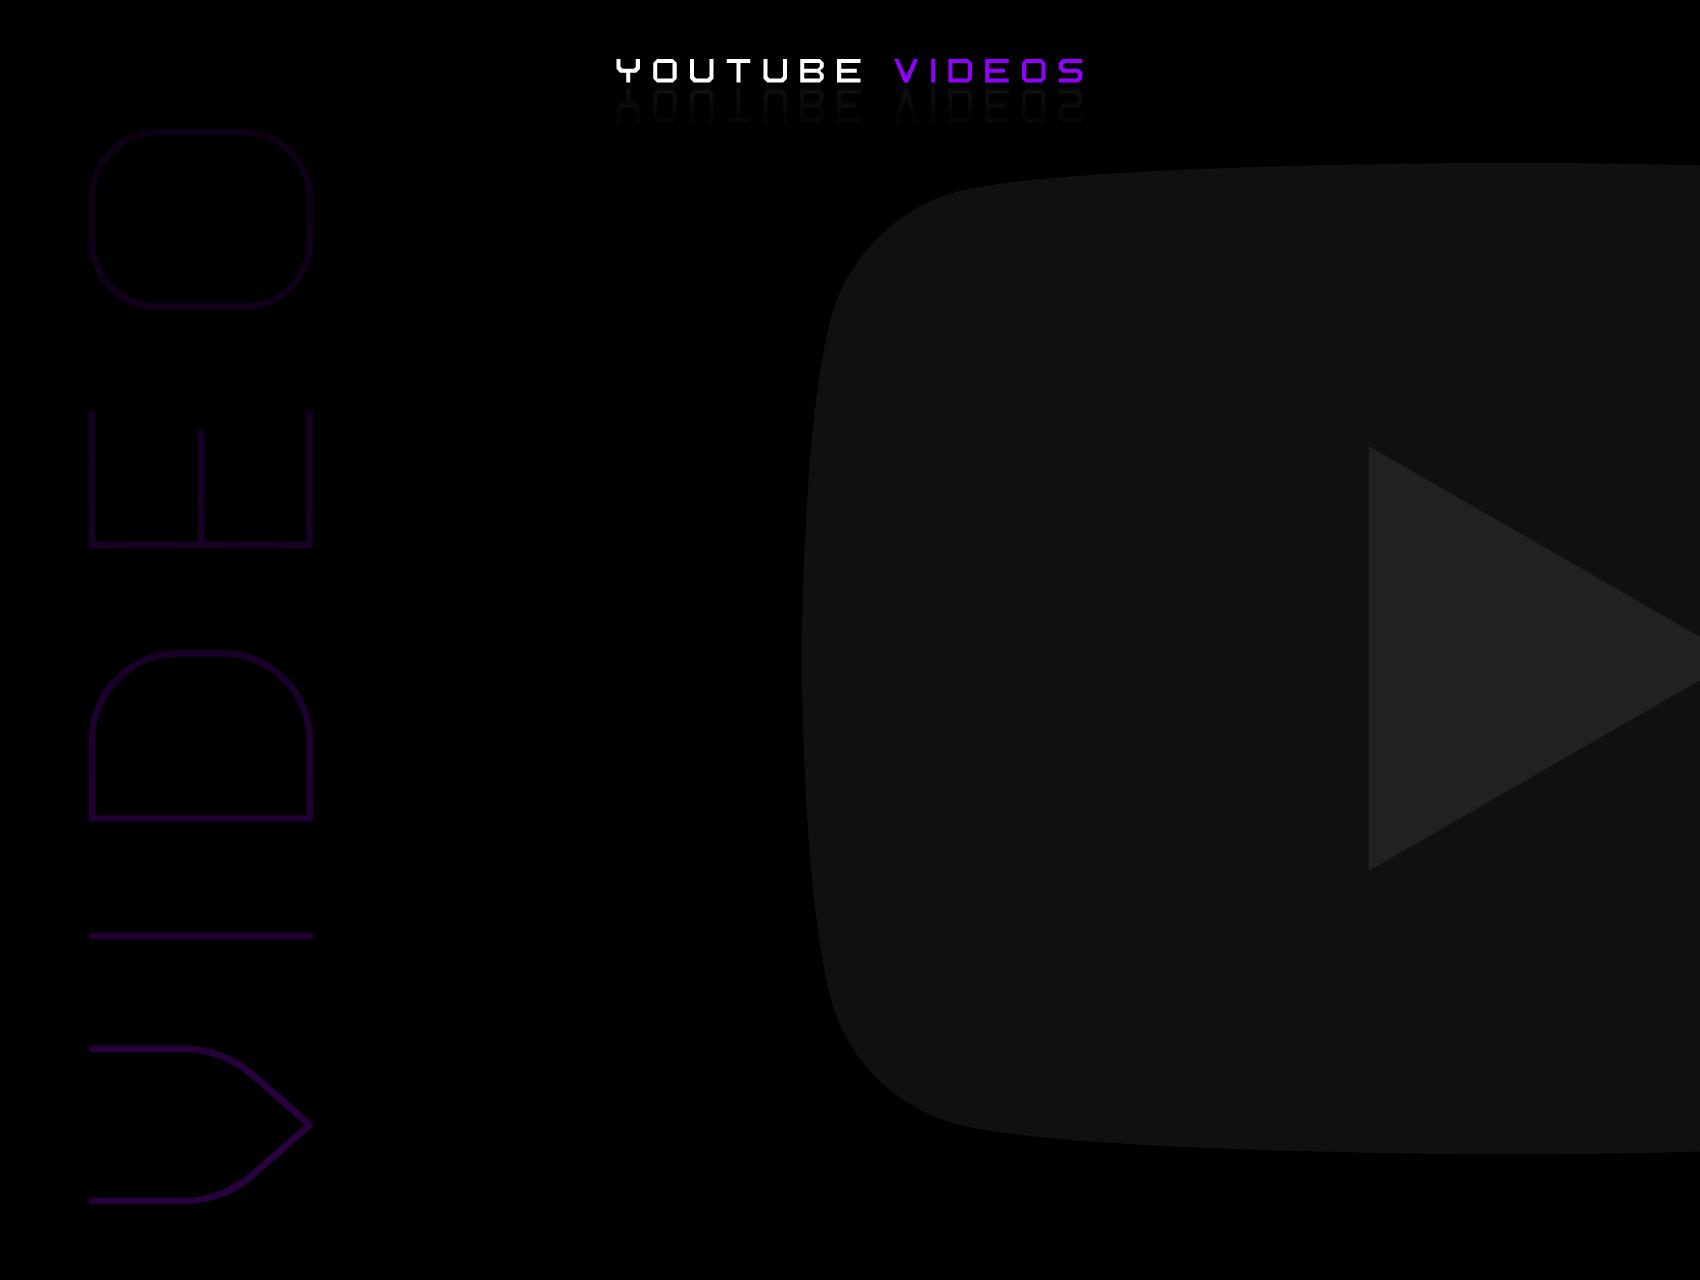 youtube videos art HD(2 ).png